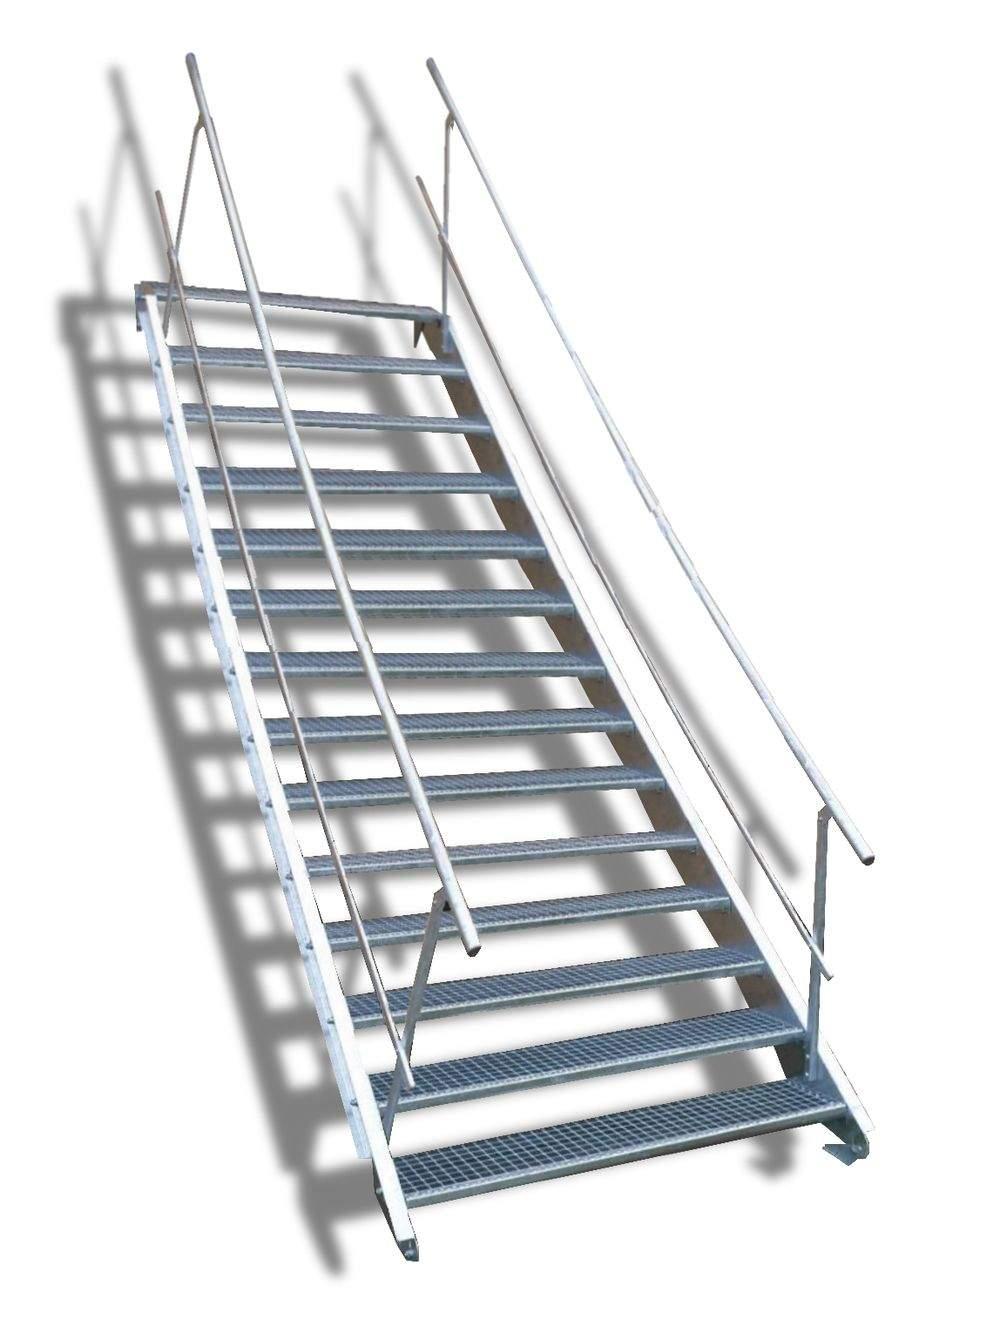 3 Stahltreppe Wangentreppe 14 Stufen Gelaender beidseitig5a4e